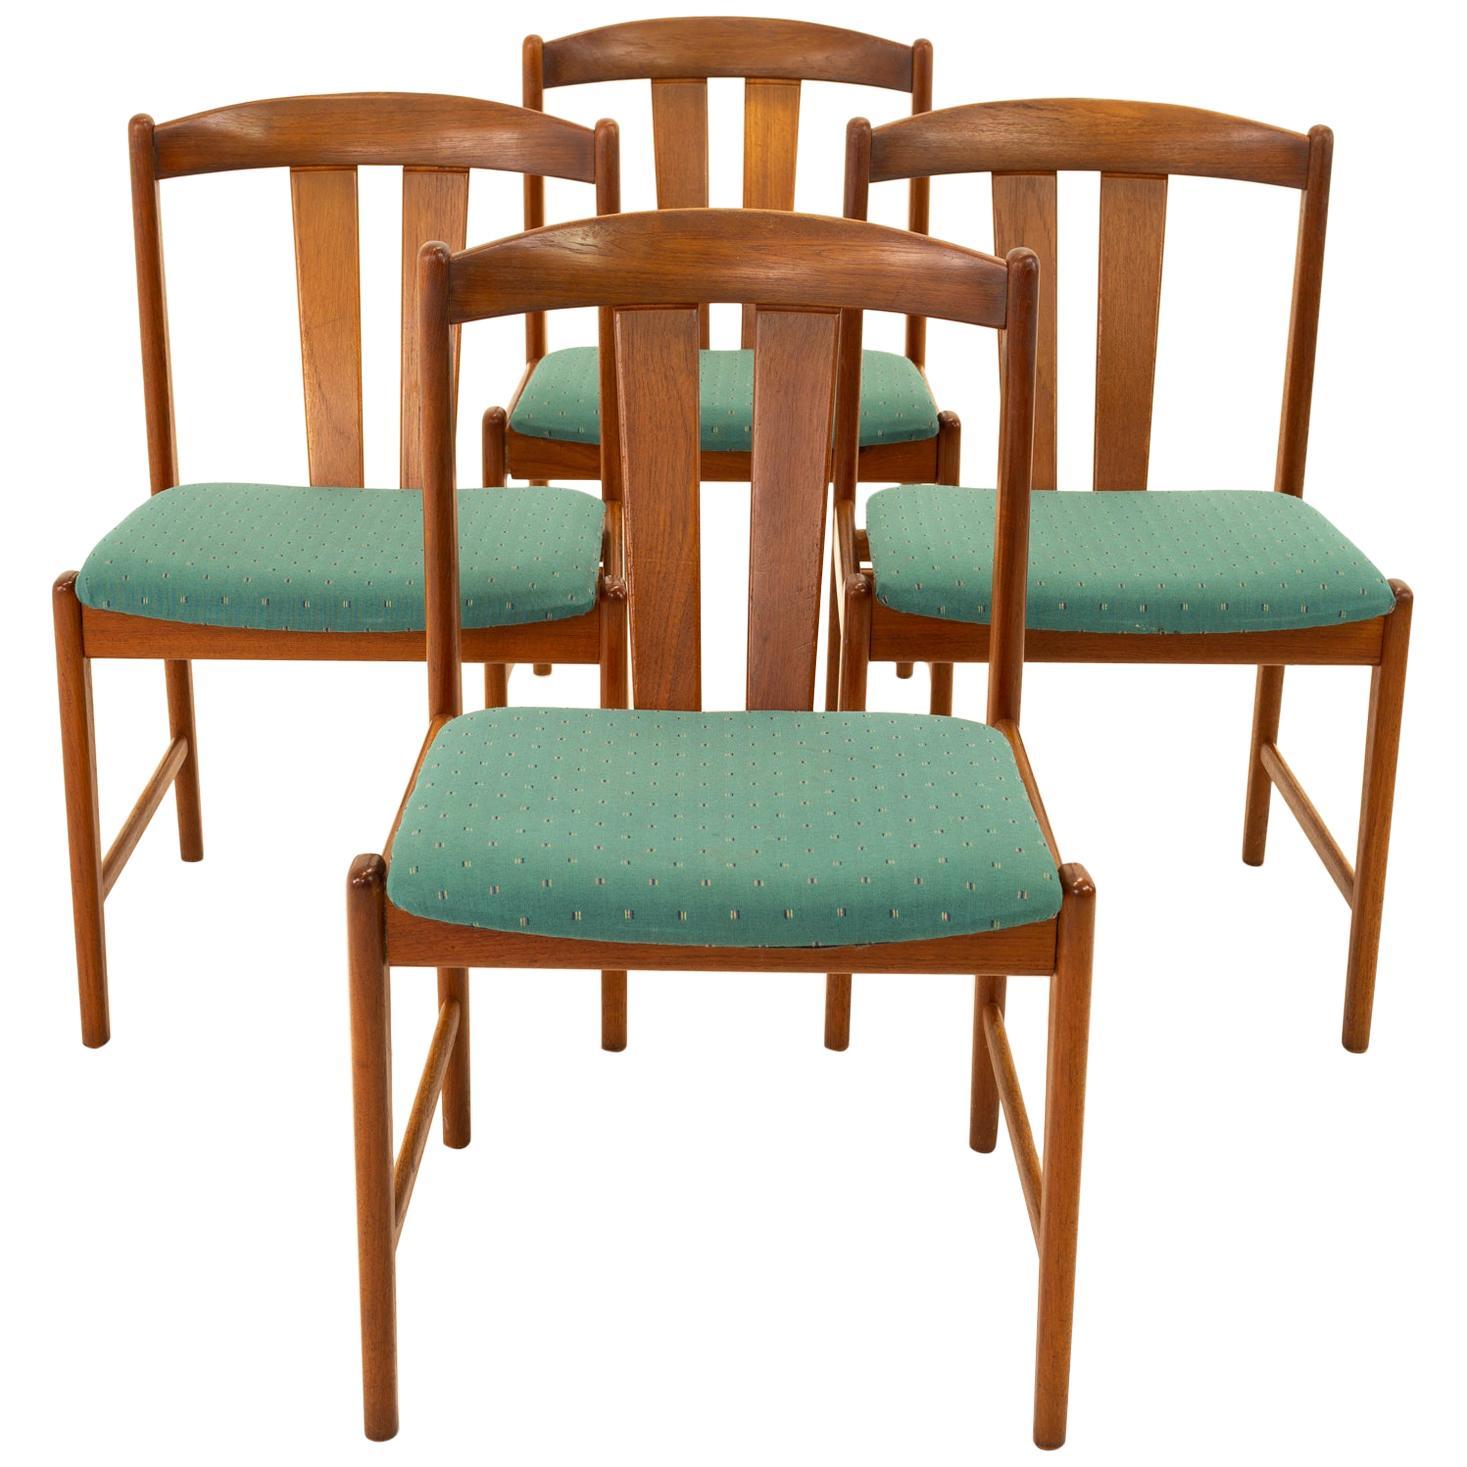 Mid Century Teak Dining Chairs, Set of 4